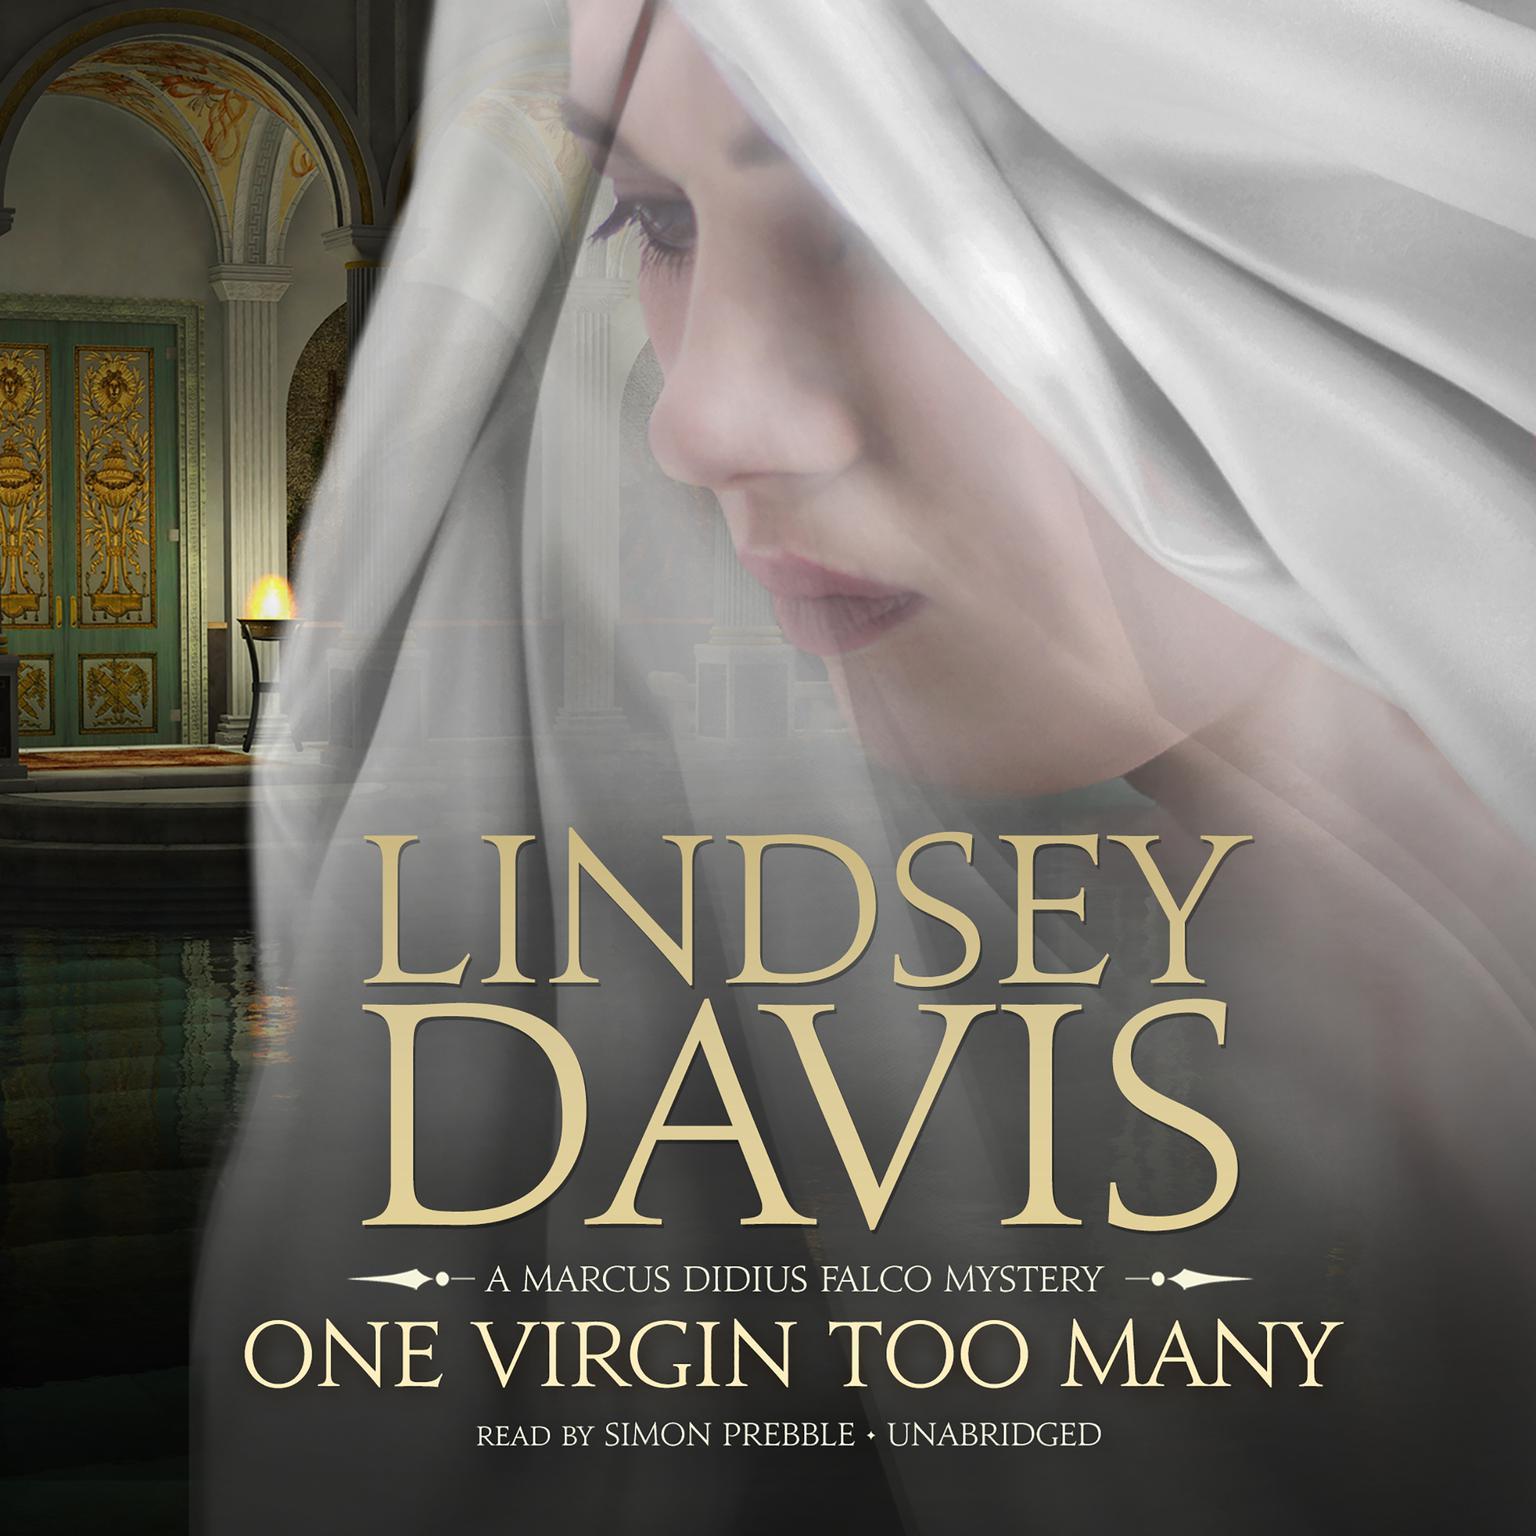 One Virgin Too Many: A Marcus Didius Falco Mystery Audiobook, by Lindsey Davis